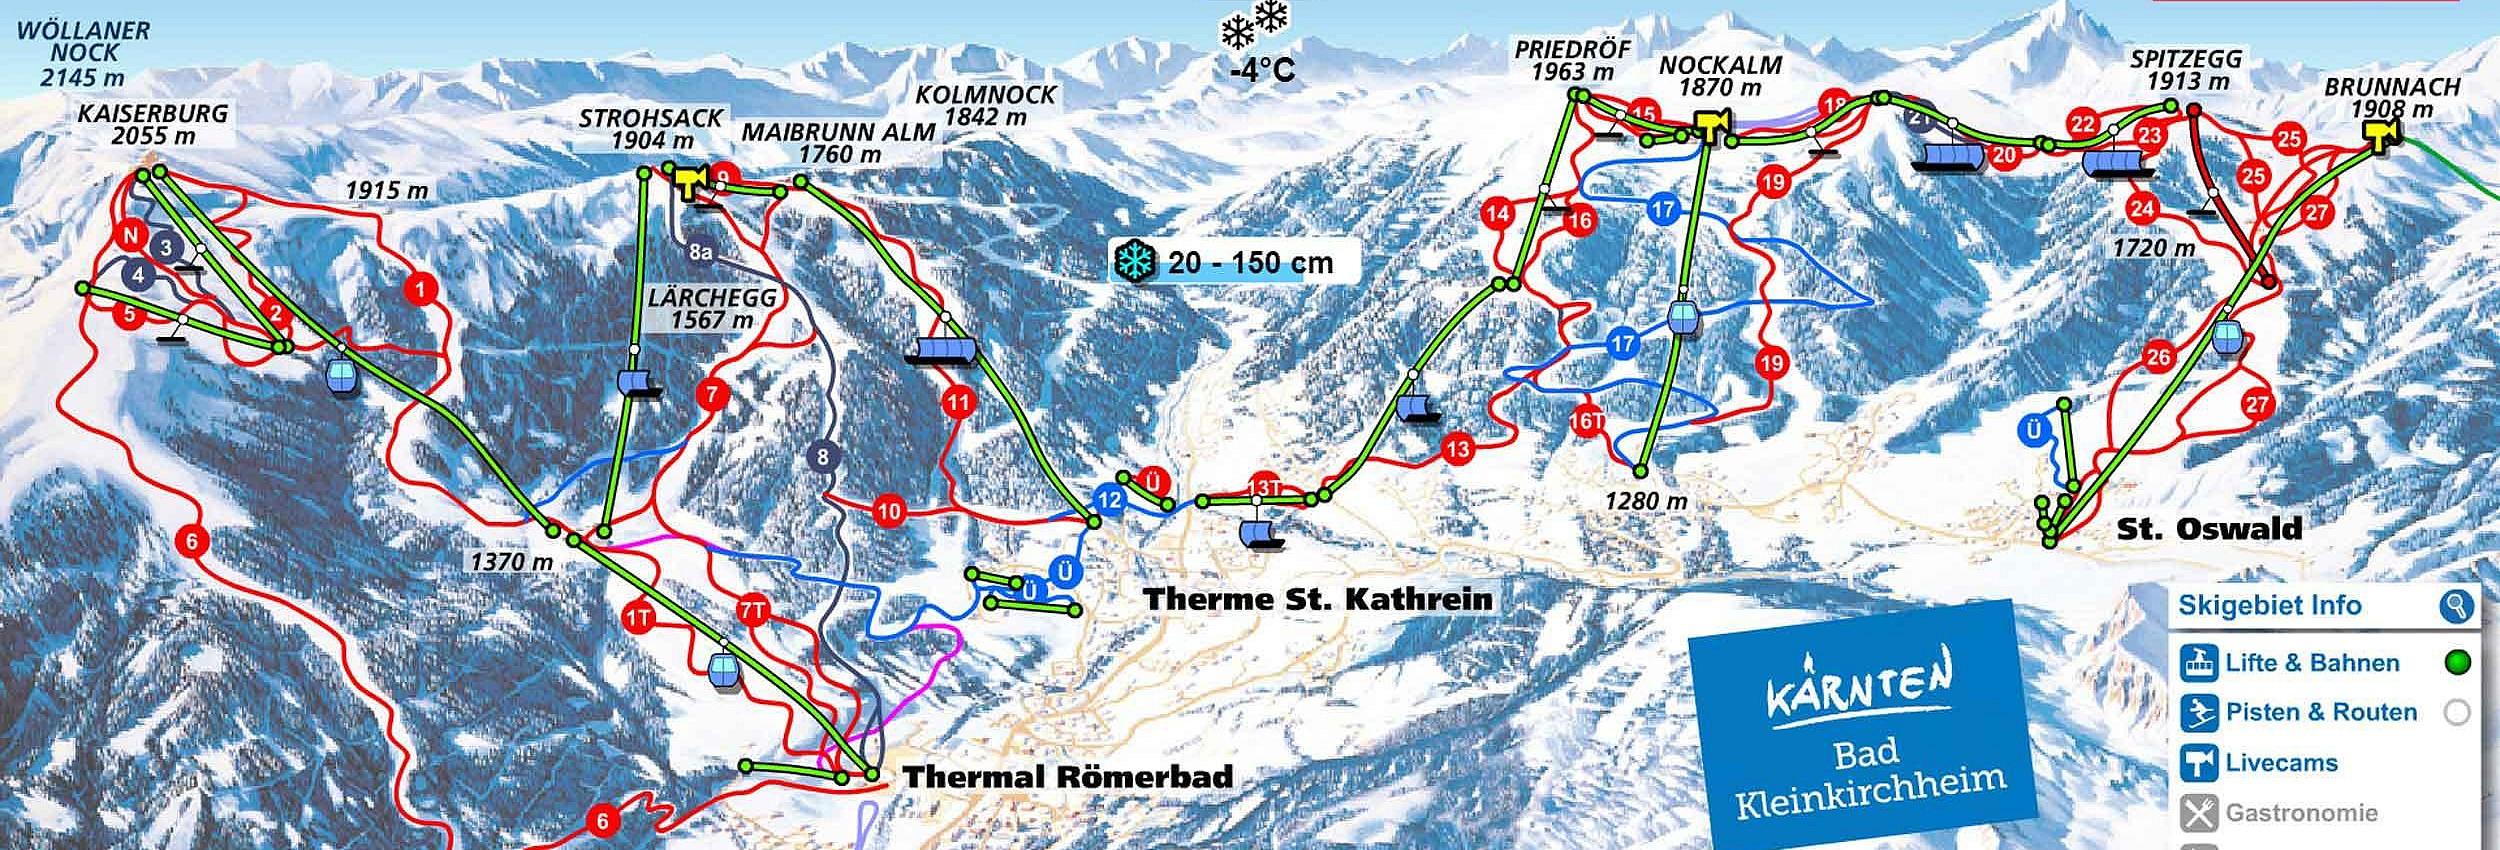 skiing & ski resorts in carinthia on lake millstatt ☆ family hotel